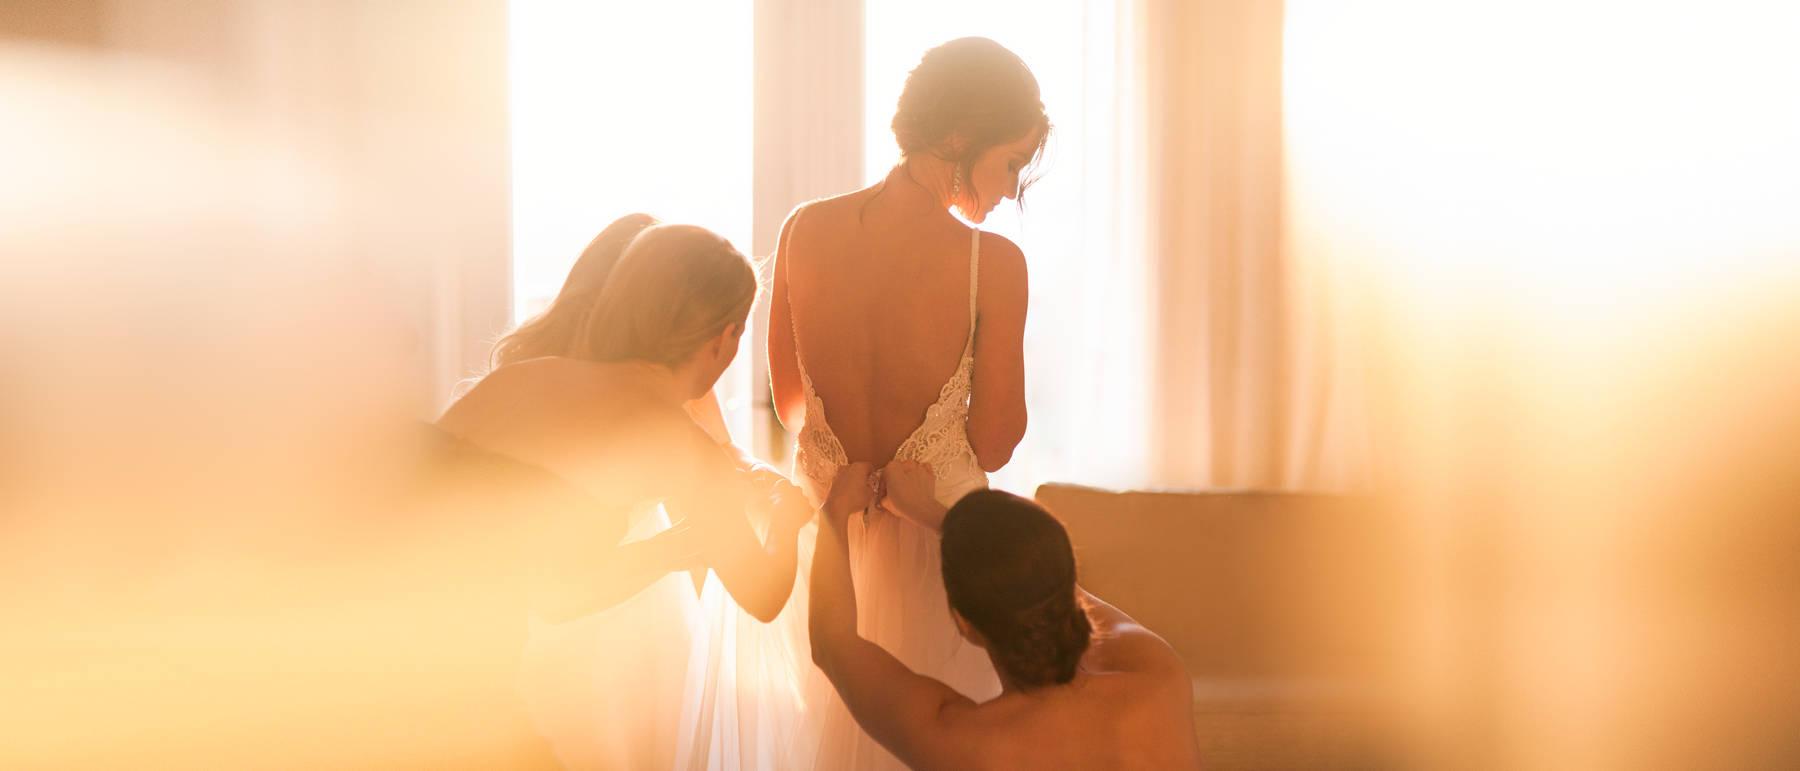 johnandjoseph-wedding-photographer-hz-slider-259